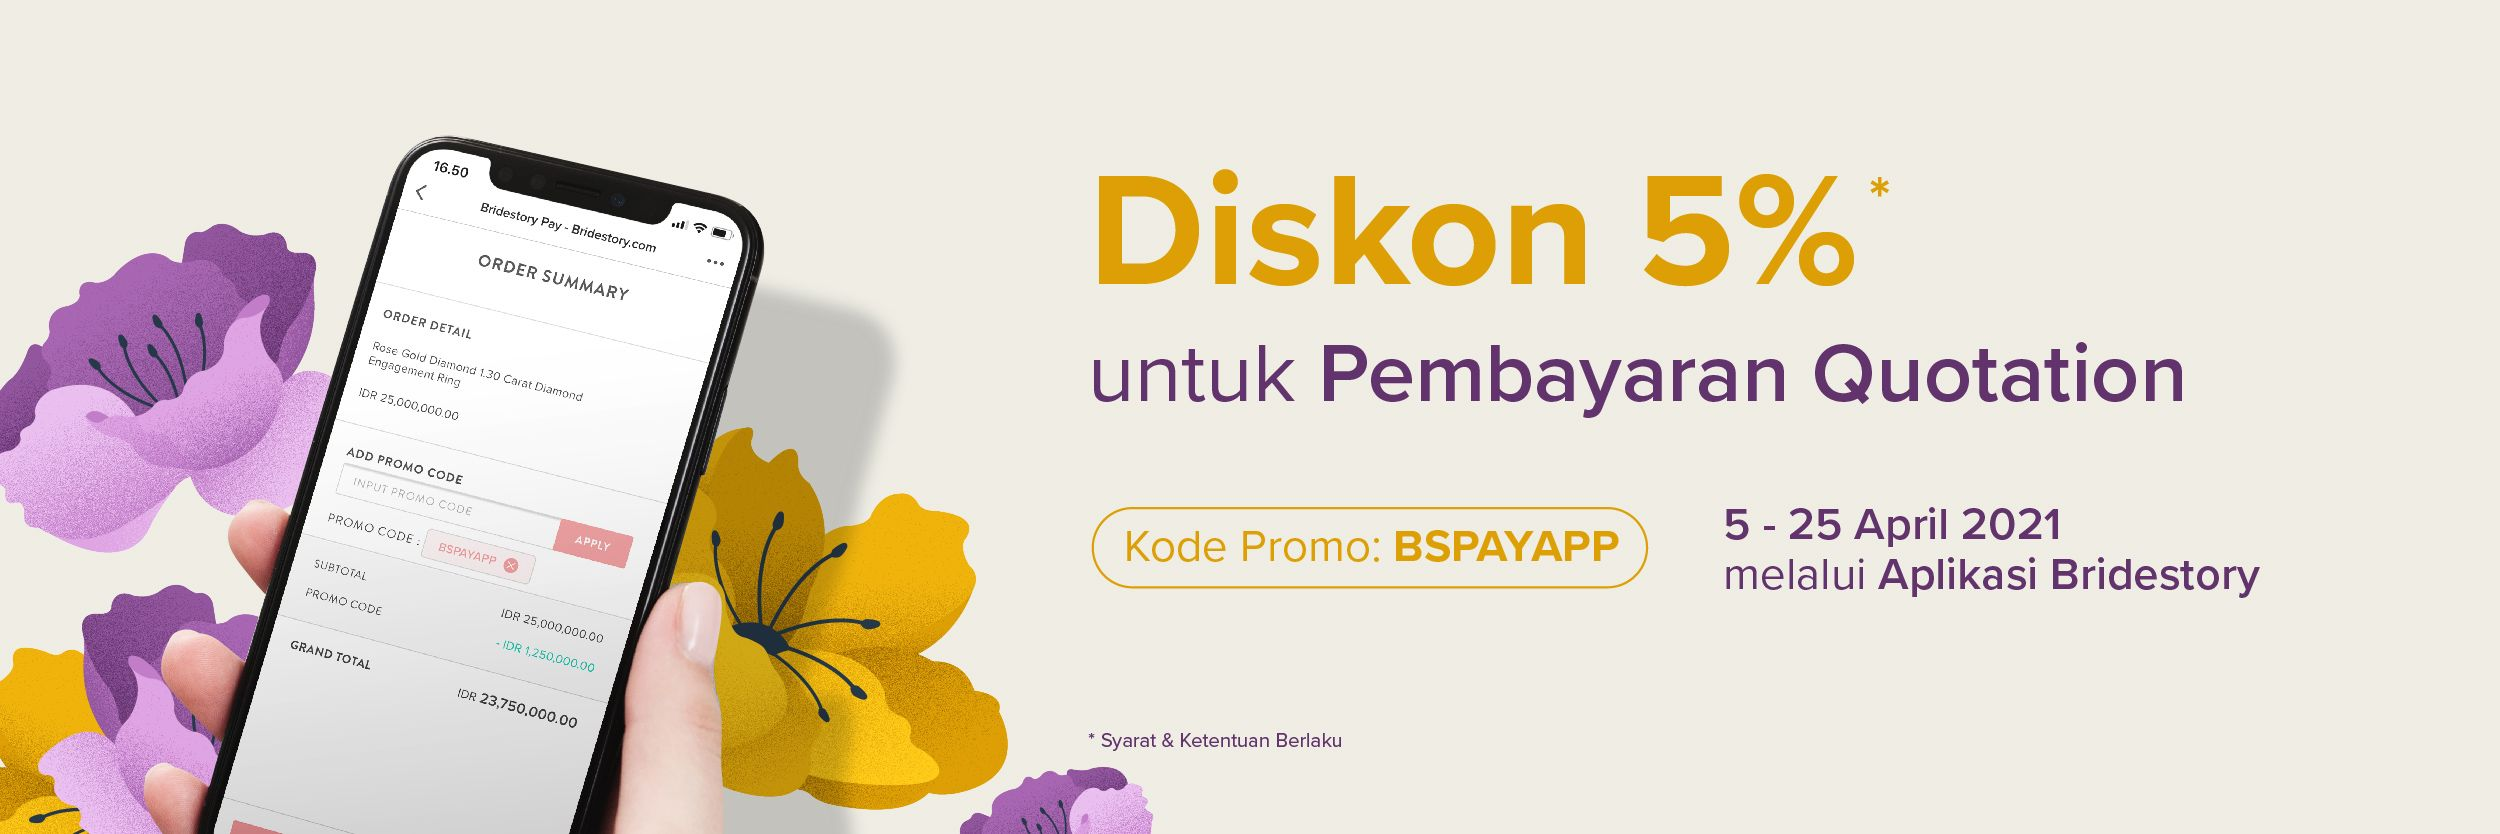 bspayapp-2_homepage-banner-1200-x-400-px-copy-HkMg1-2ru.jpg